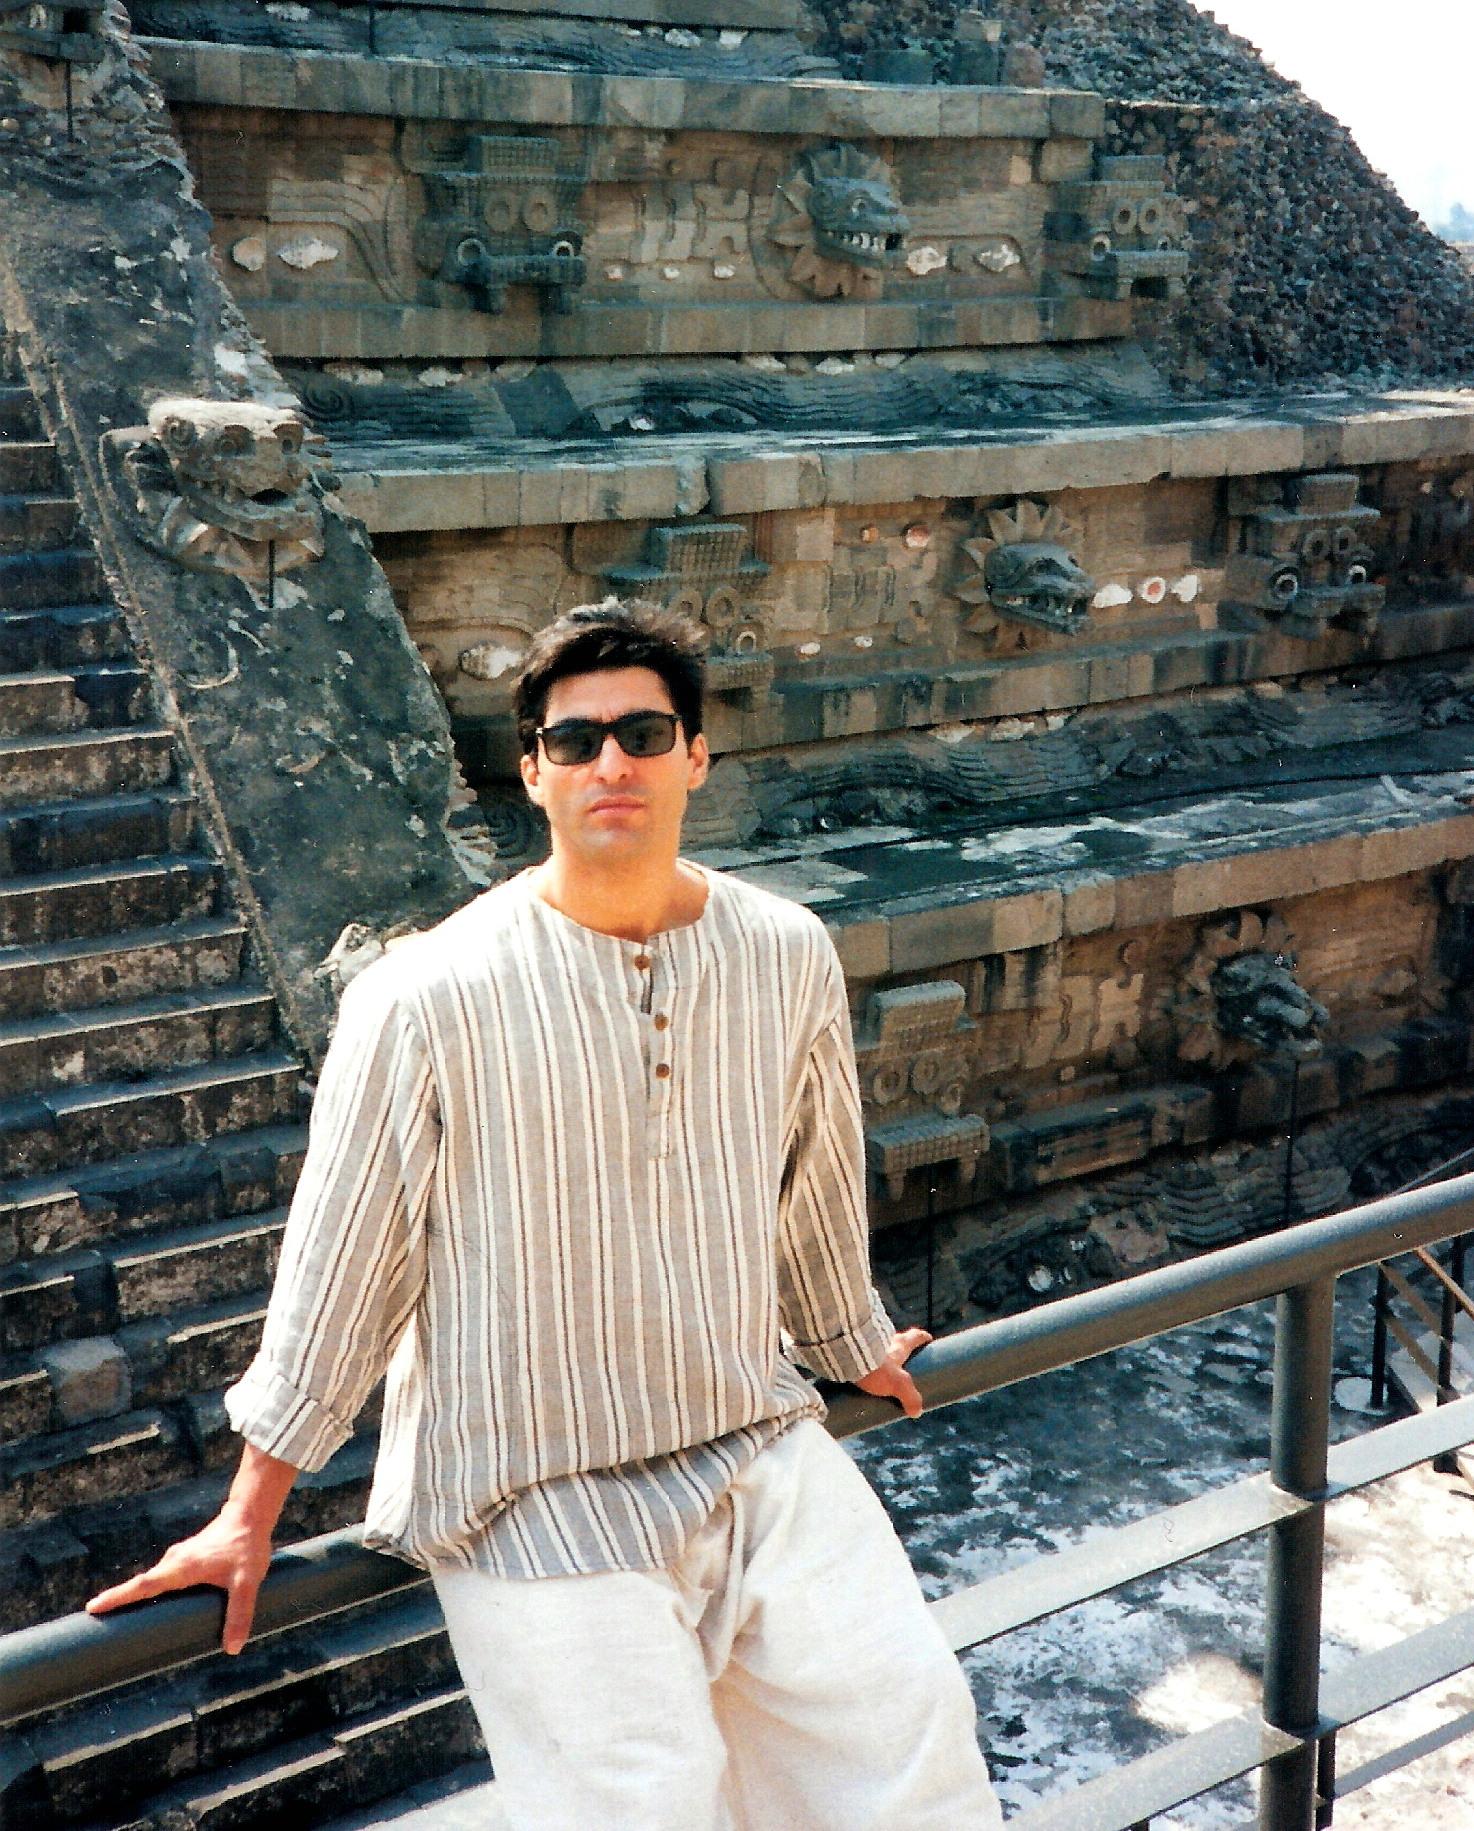 2012-02-29-Mayan_Pyramids_1editsmalla.jpg